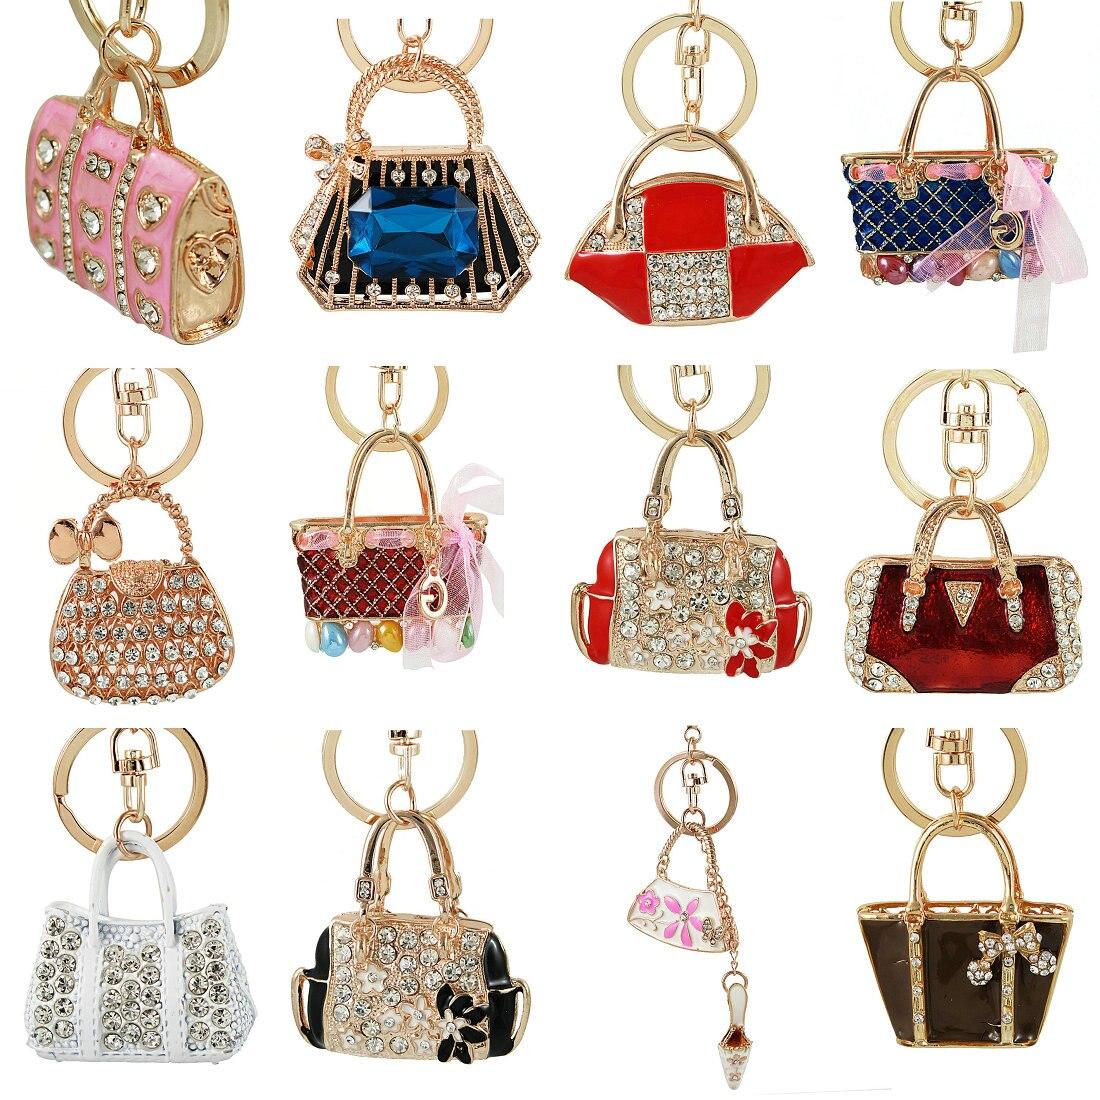 Handbag Women Gift Popular Accessories Key Chain Key Ring Fashion Jewelry